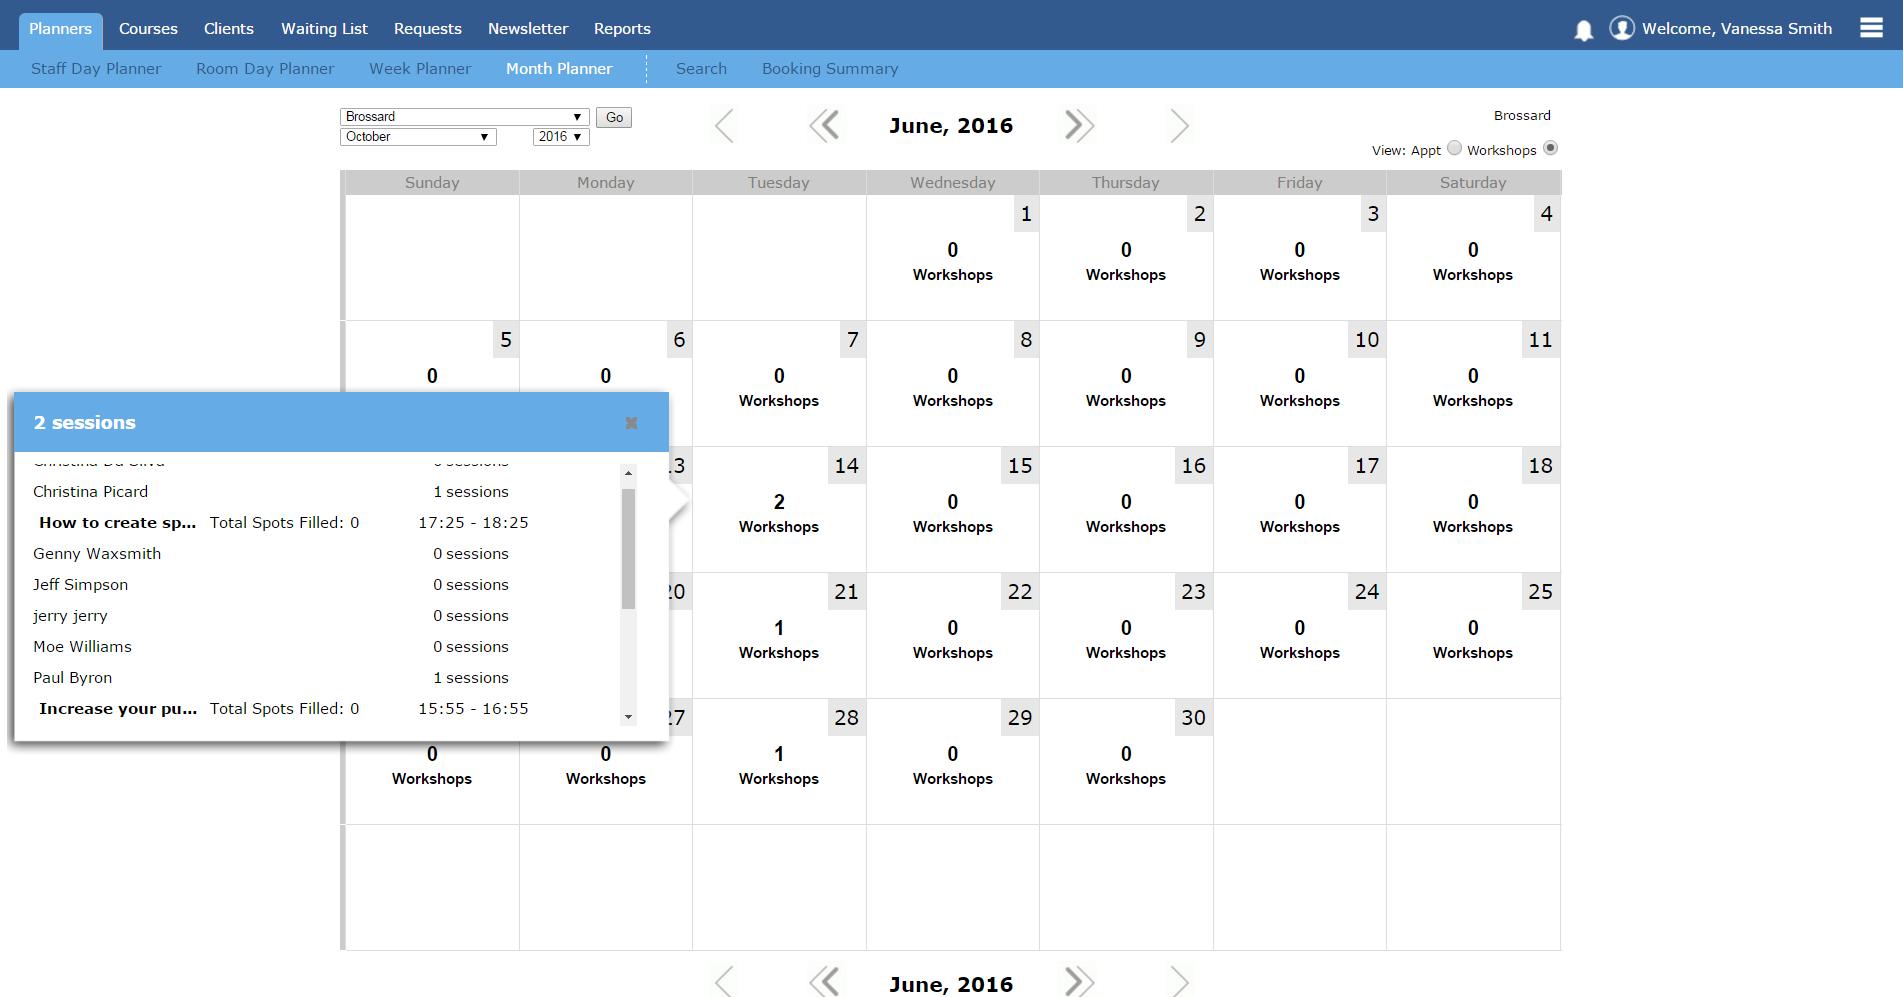 Month planner in workshops mode